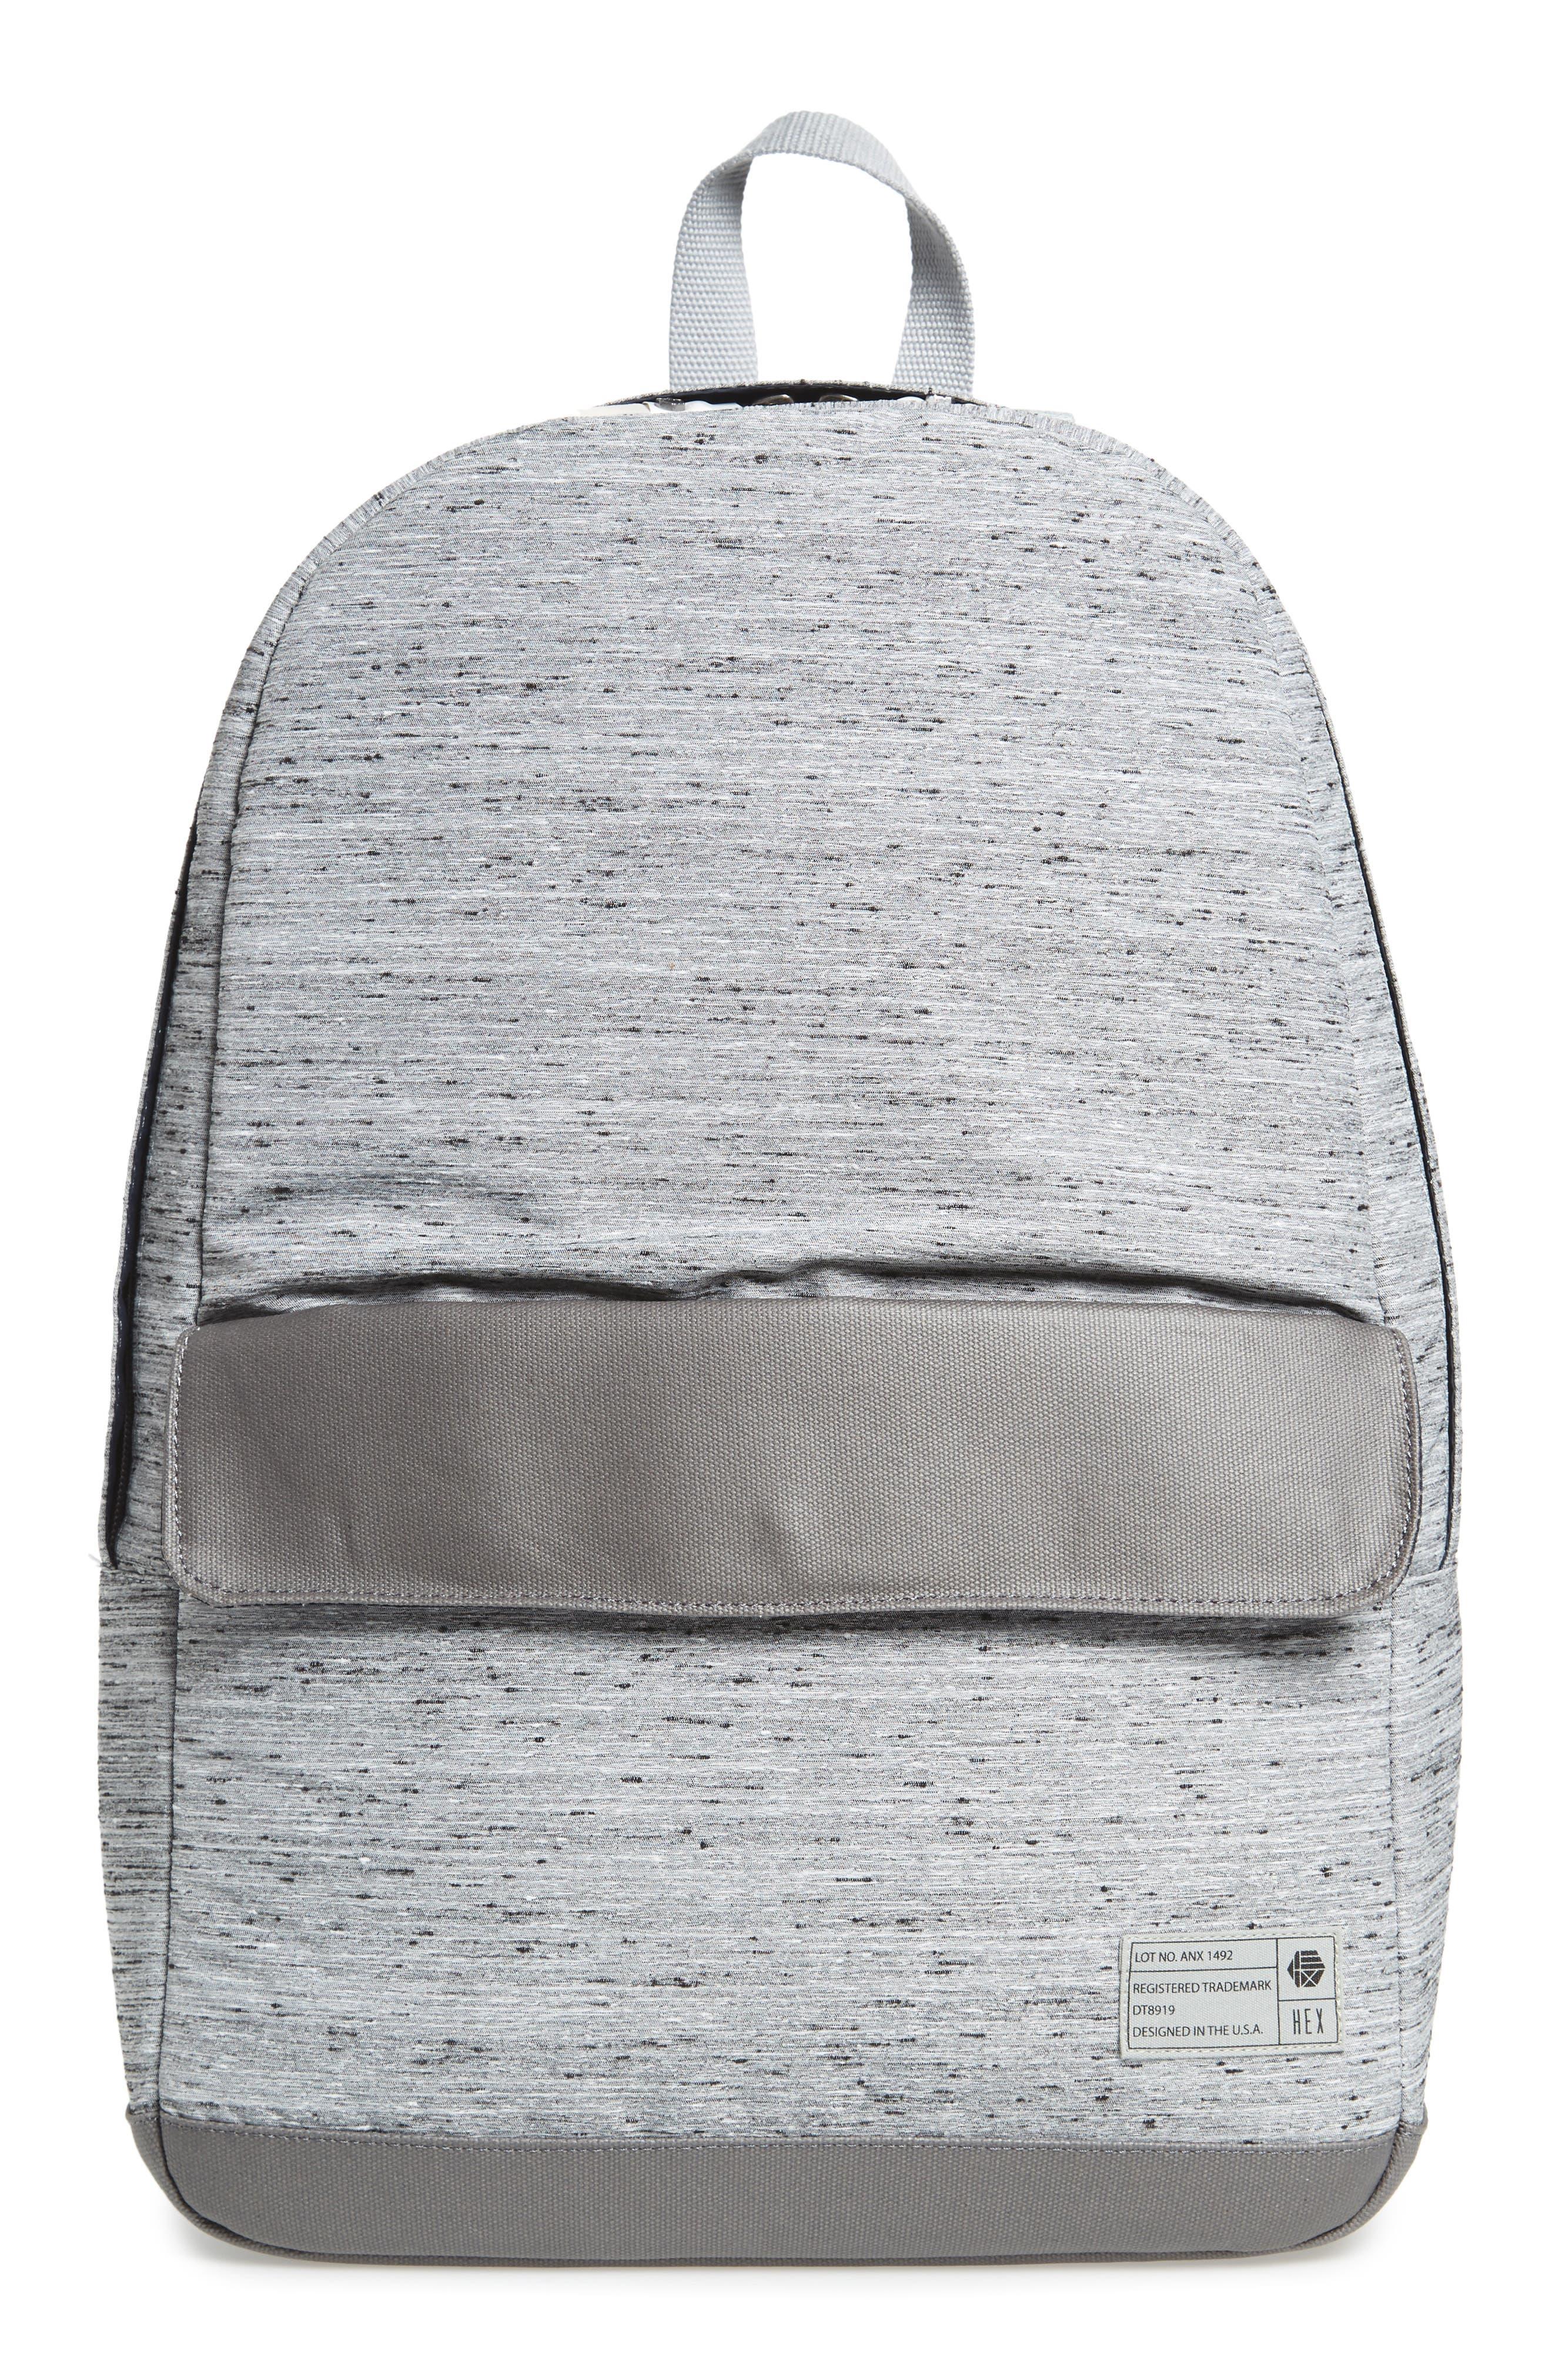 HEX 'Echo' Backpack